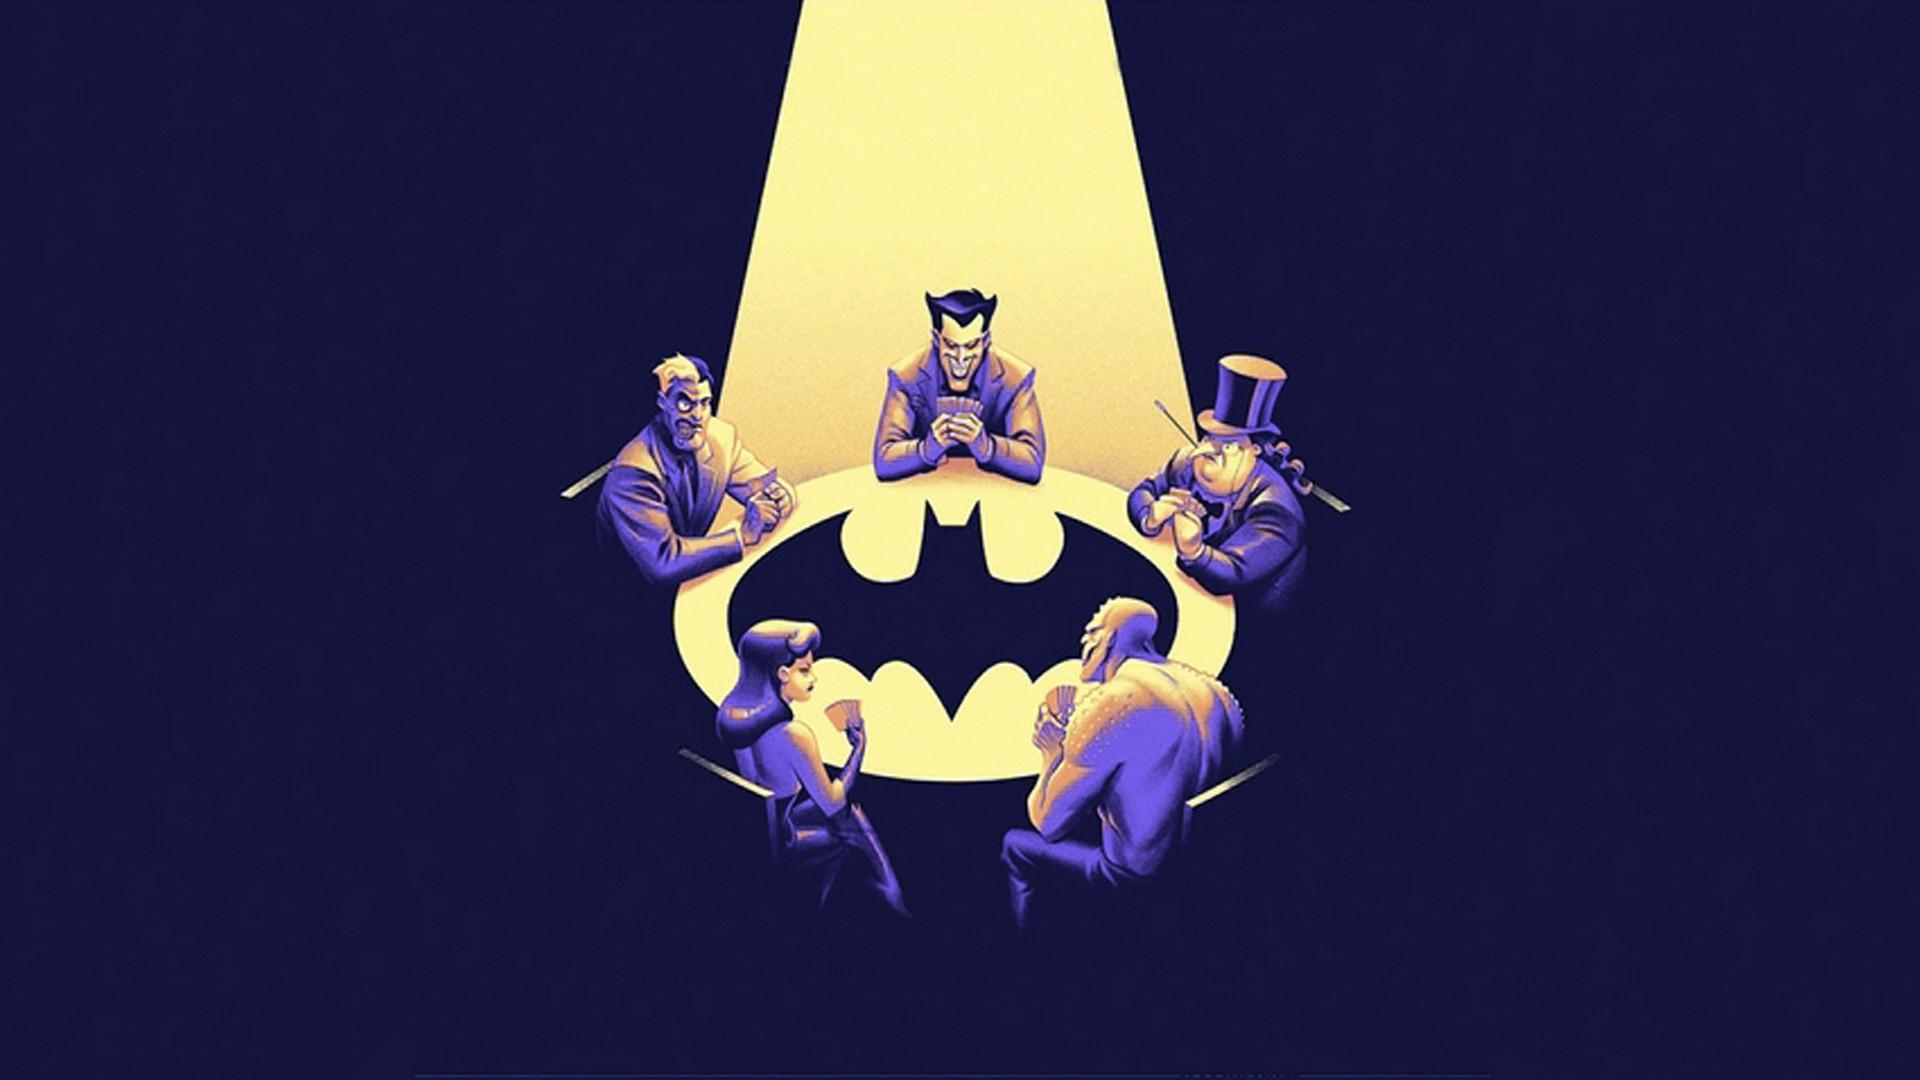 Joker Wallpaper Hd Iphone 5 Batman Batman The Animated Series Joker Two Face